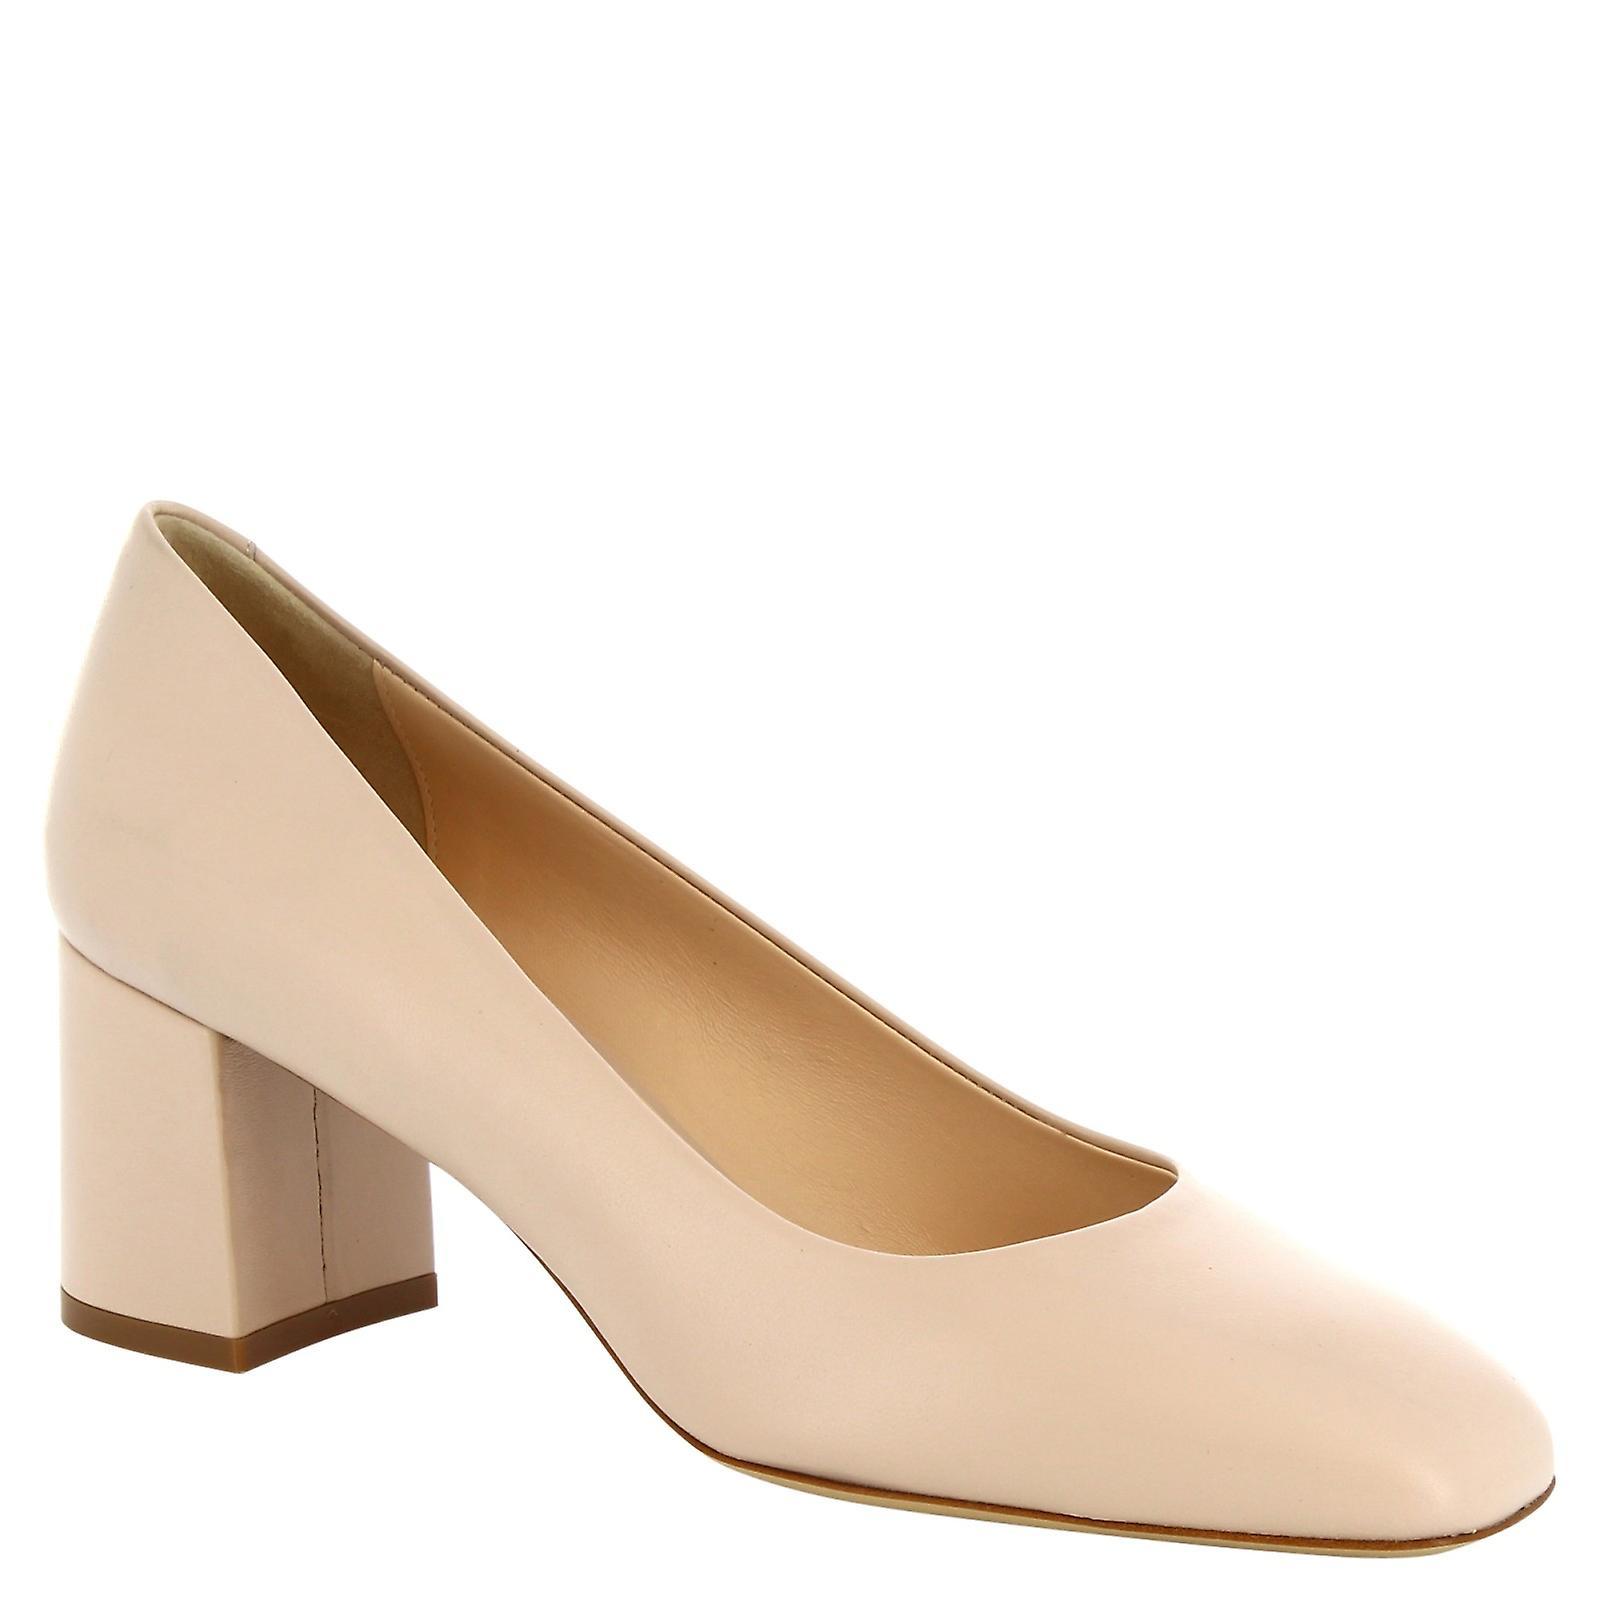 Leonardo Shoes Women's handmade squared toe pumps in beige calf leather eNgWZ